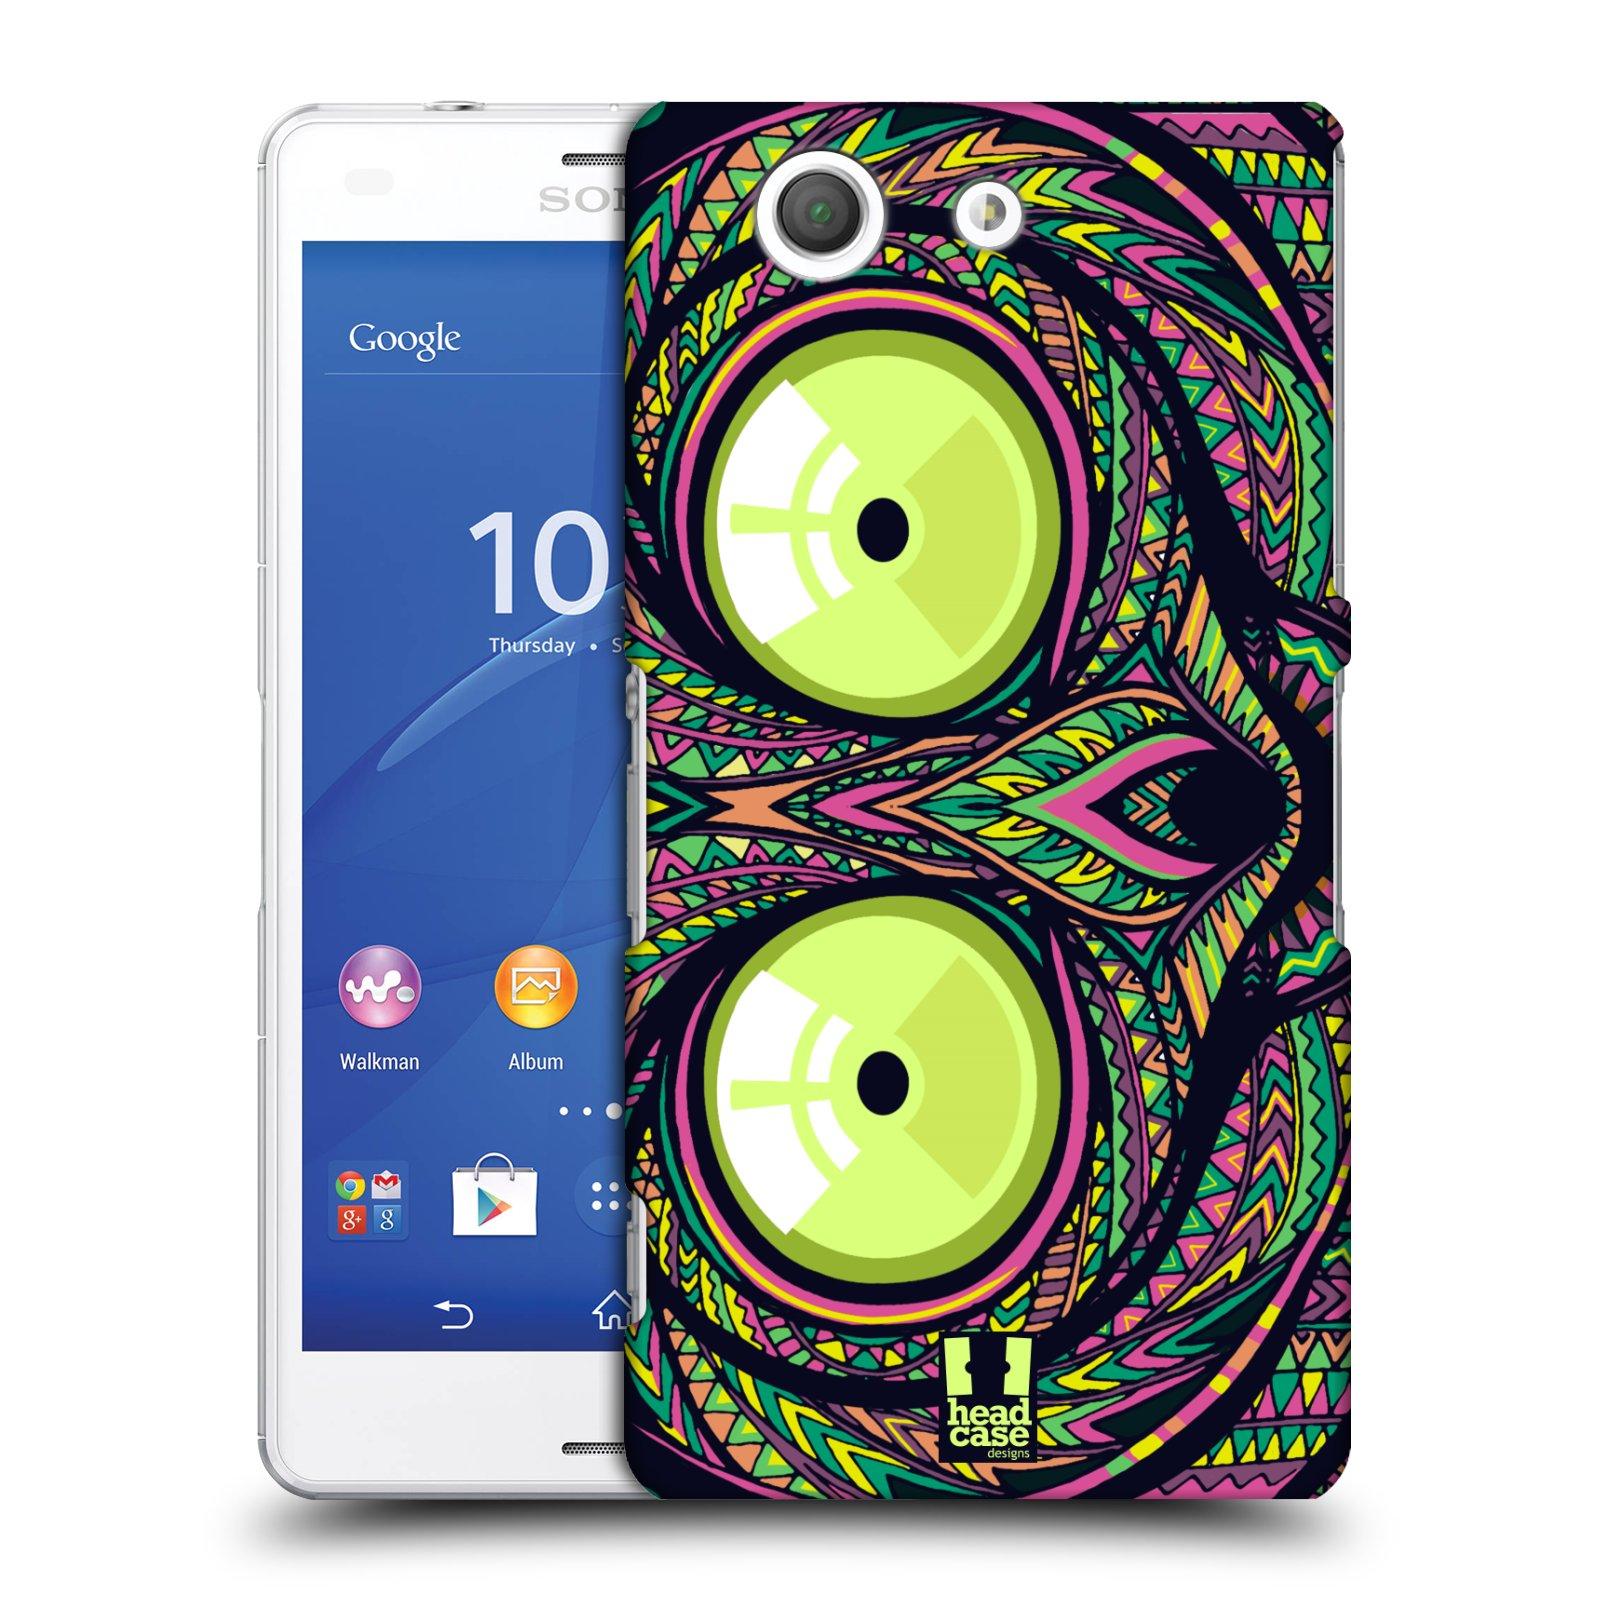 Plastové pouzdro na mobil Sony Xperia Z3 Compact D5803 HEAD CASE AZTEC NÁRTOUN